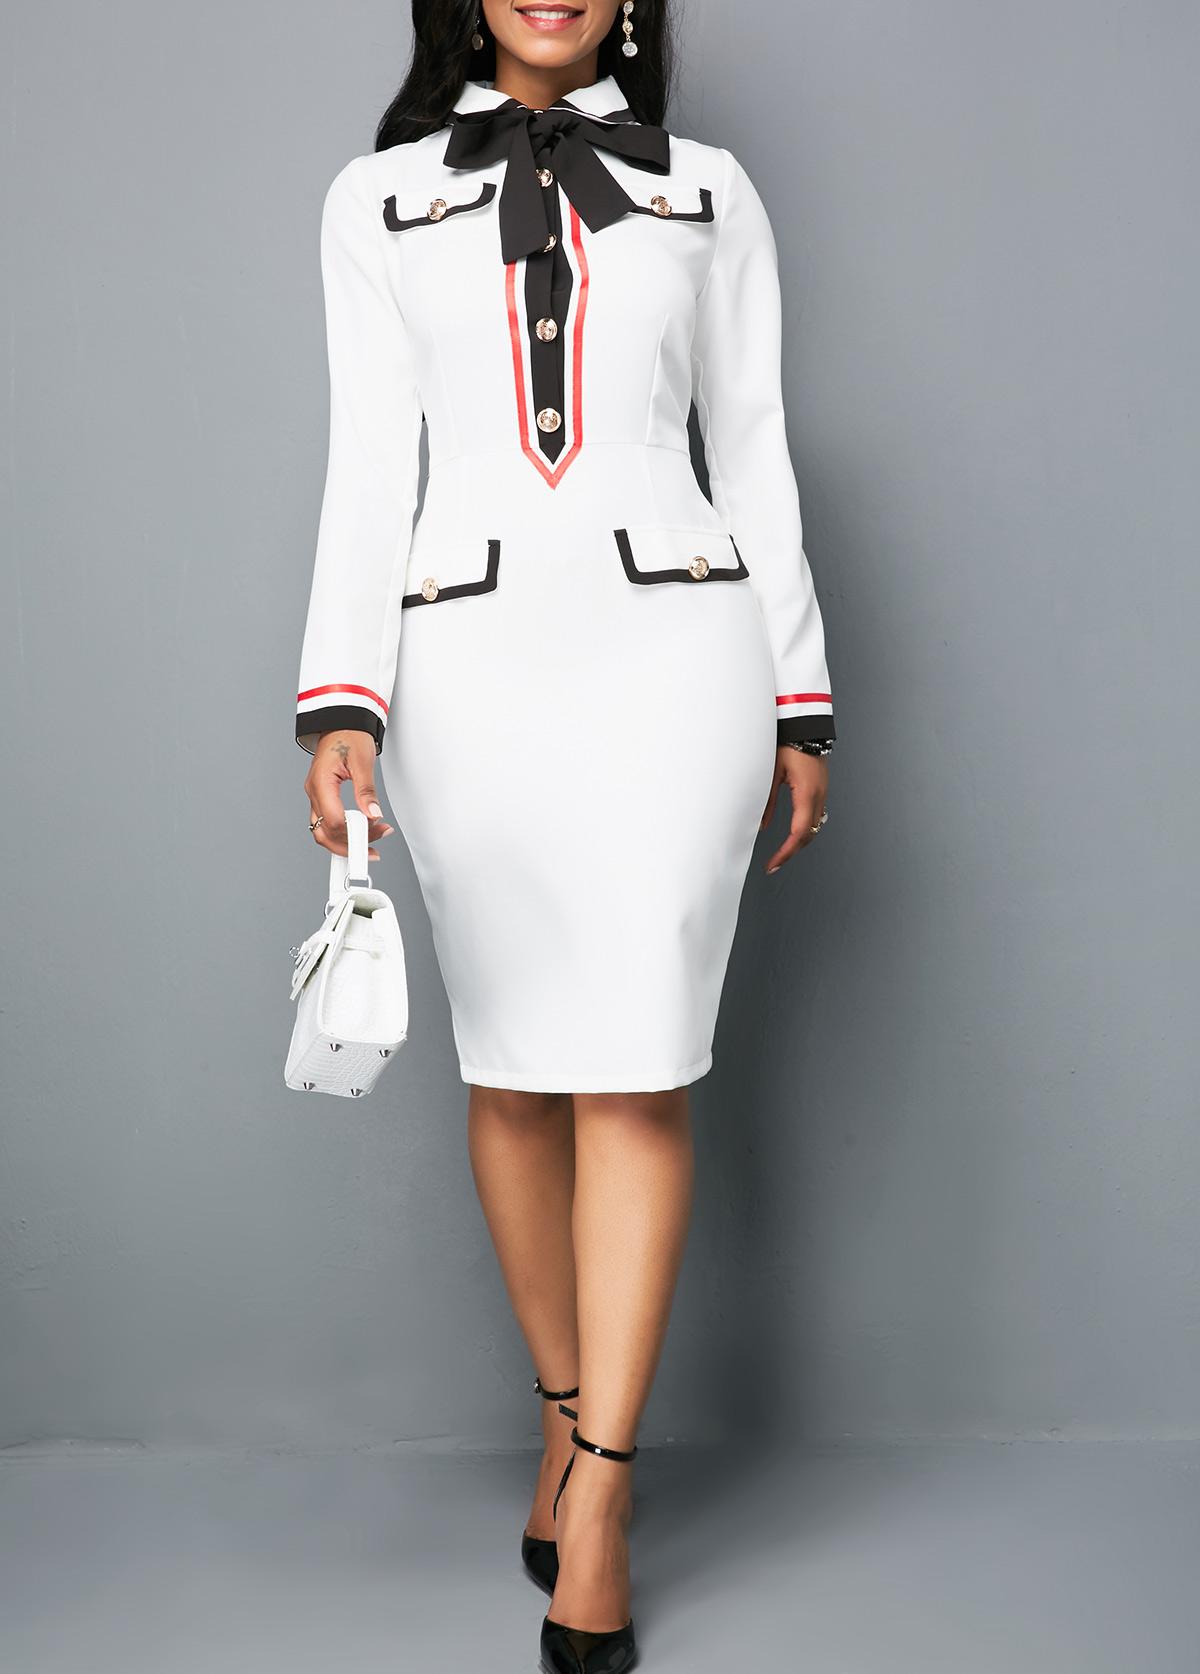 Tie Neck Button Front White Sheath Dress